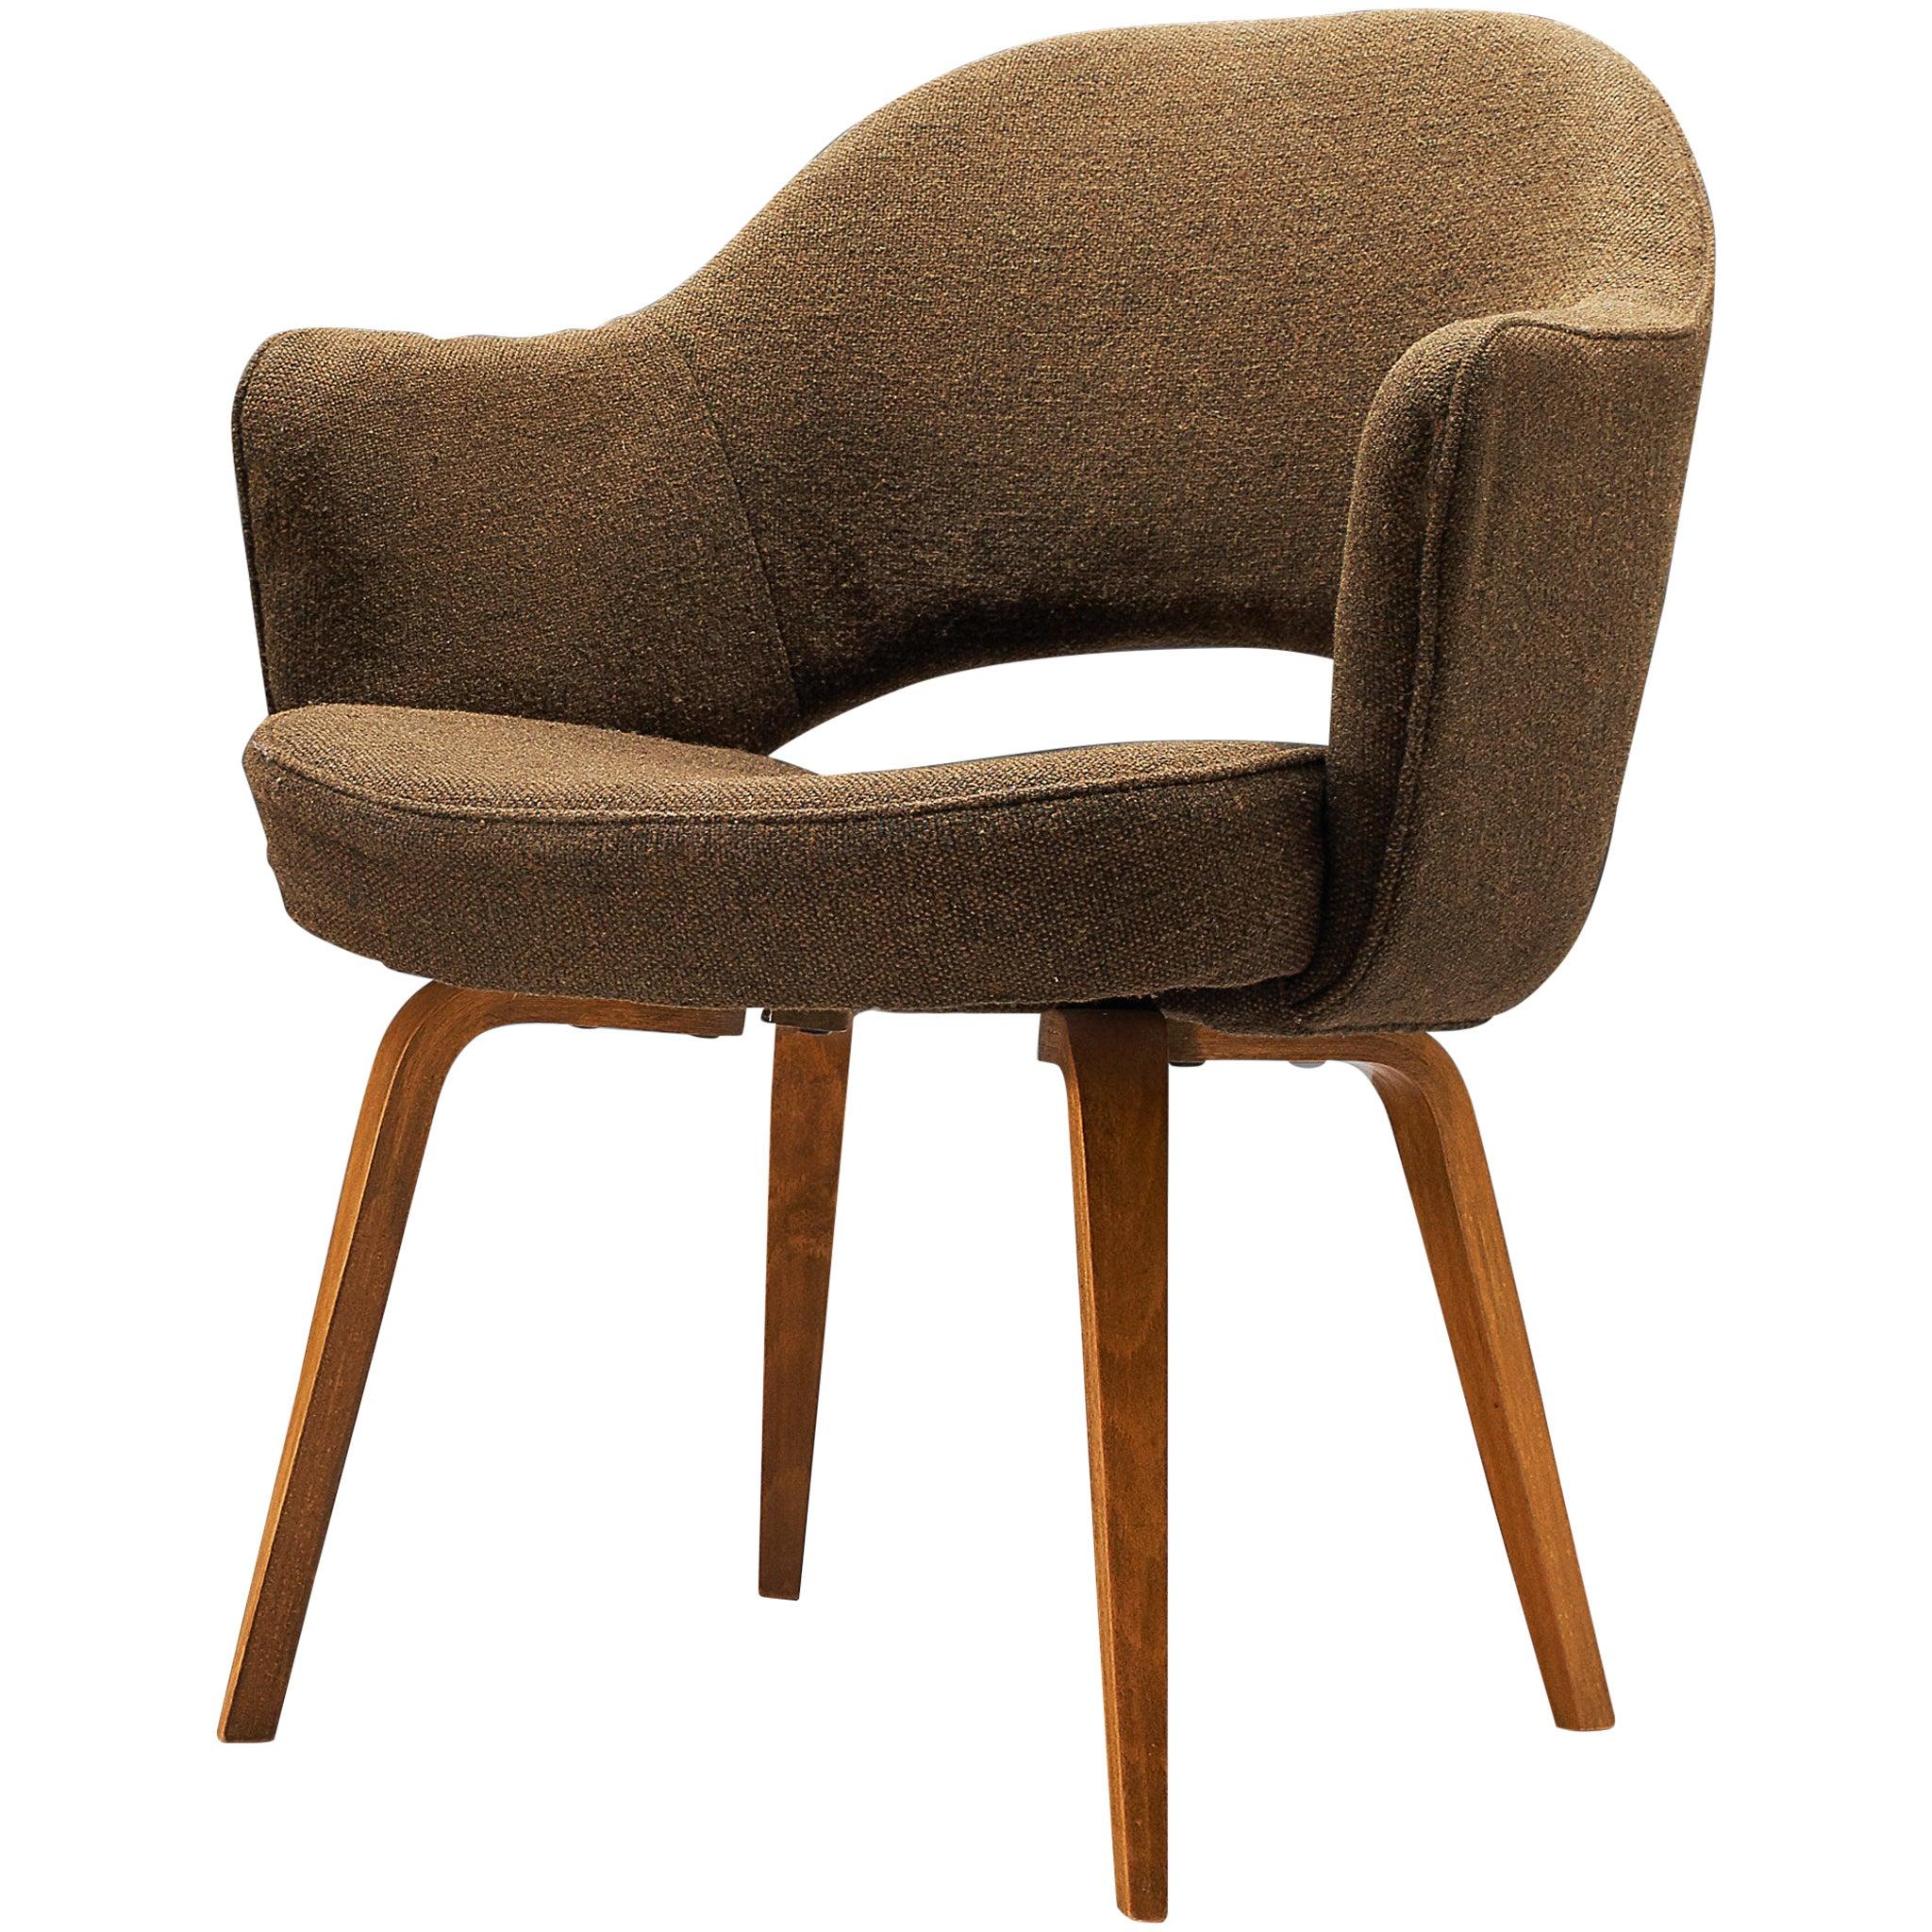 Eero Saarinen for Knoll Customizable Executive Armchair